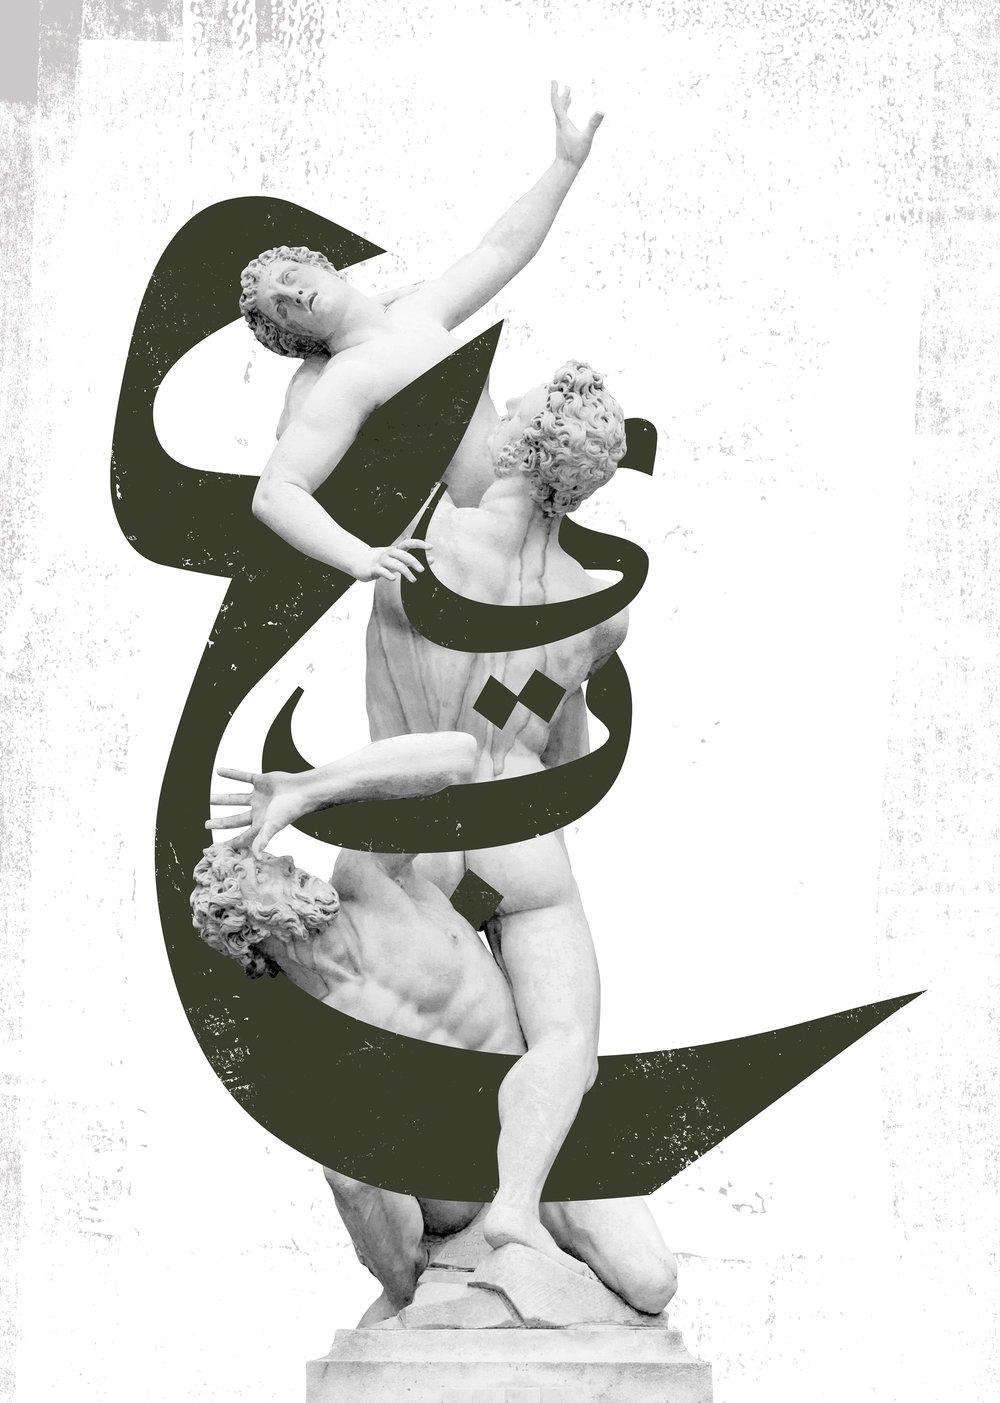 <b>Younes Zemmouri</b></br><i>Aïb (Shame</i> series)</br>digital art print on archival paper</br>limited edition of 30</br>20 x 16 inches</br>$400 unframed / $600 framed